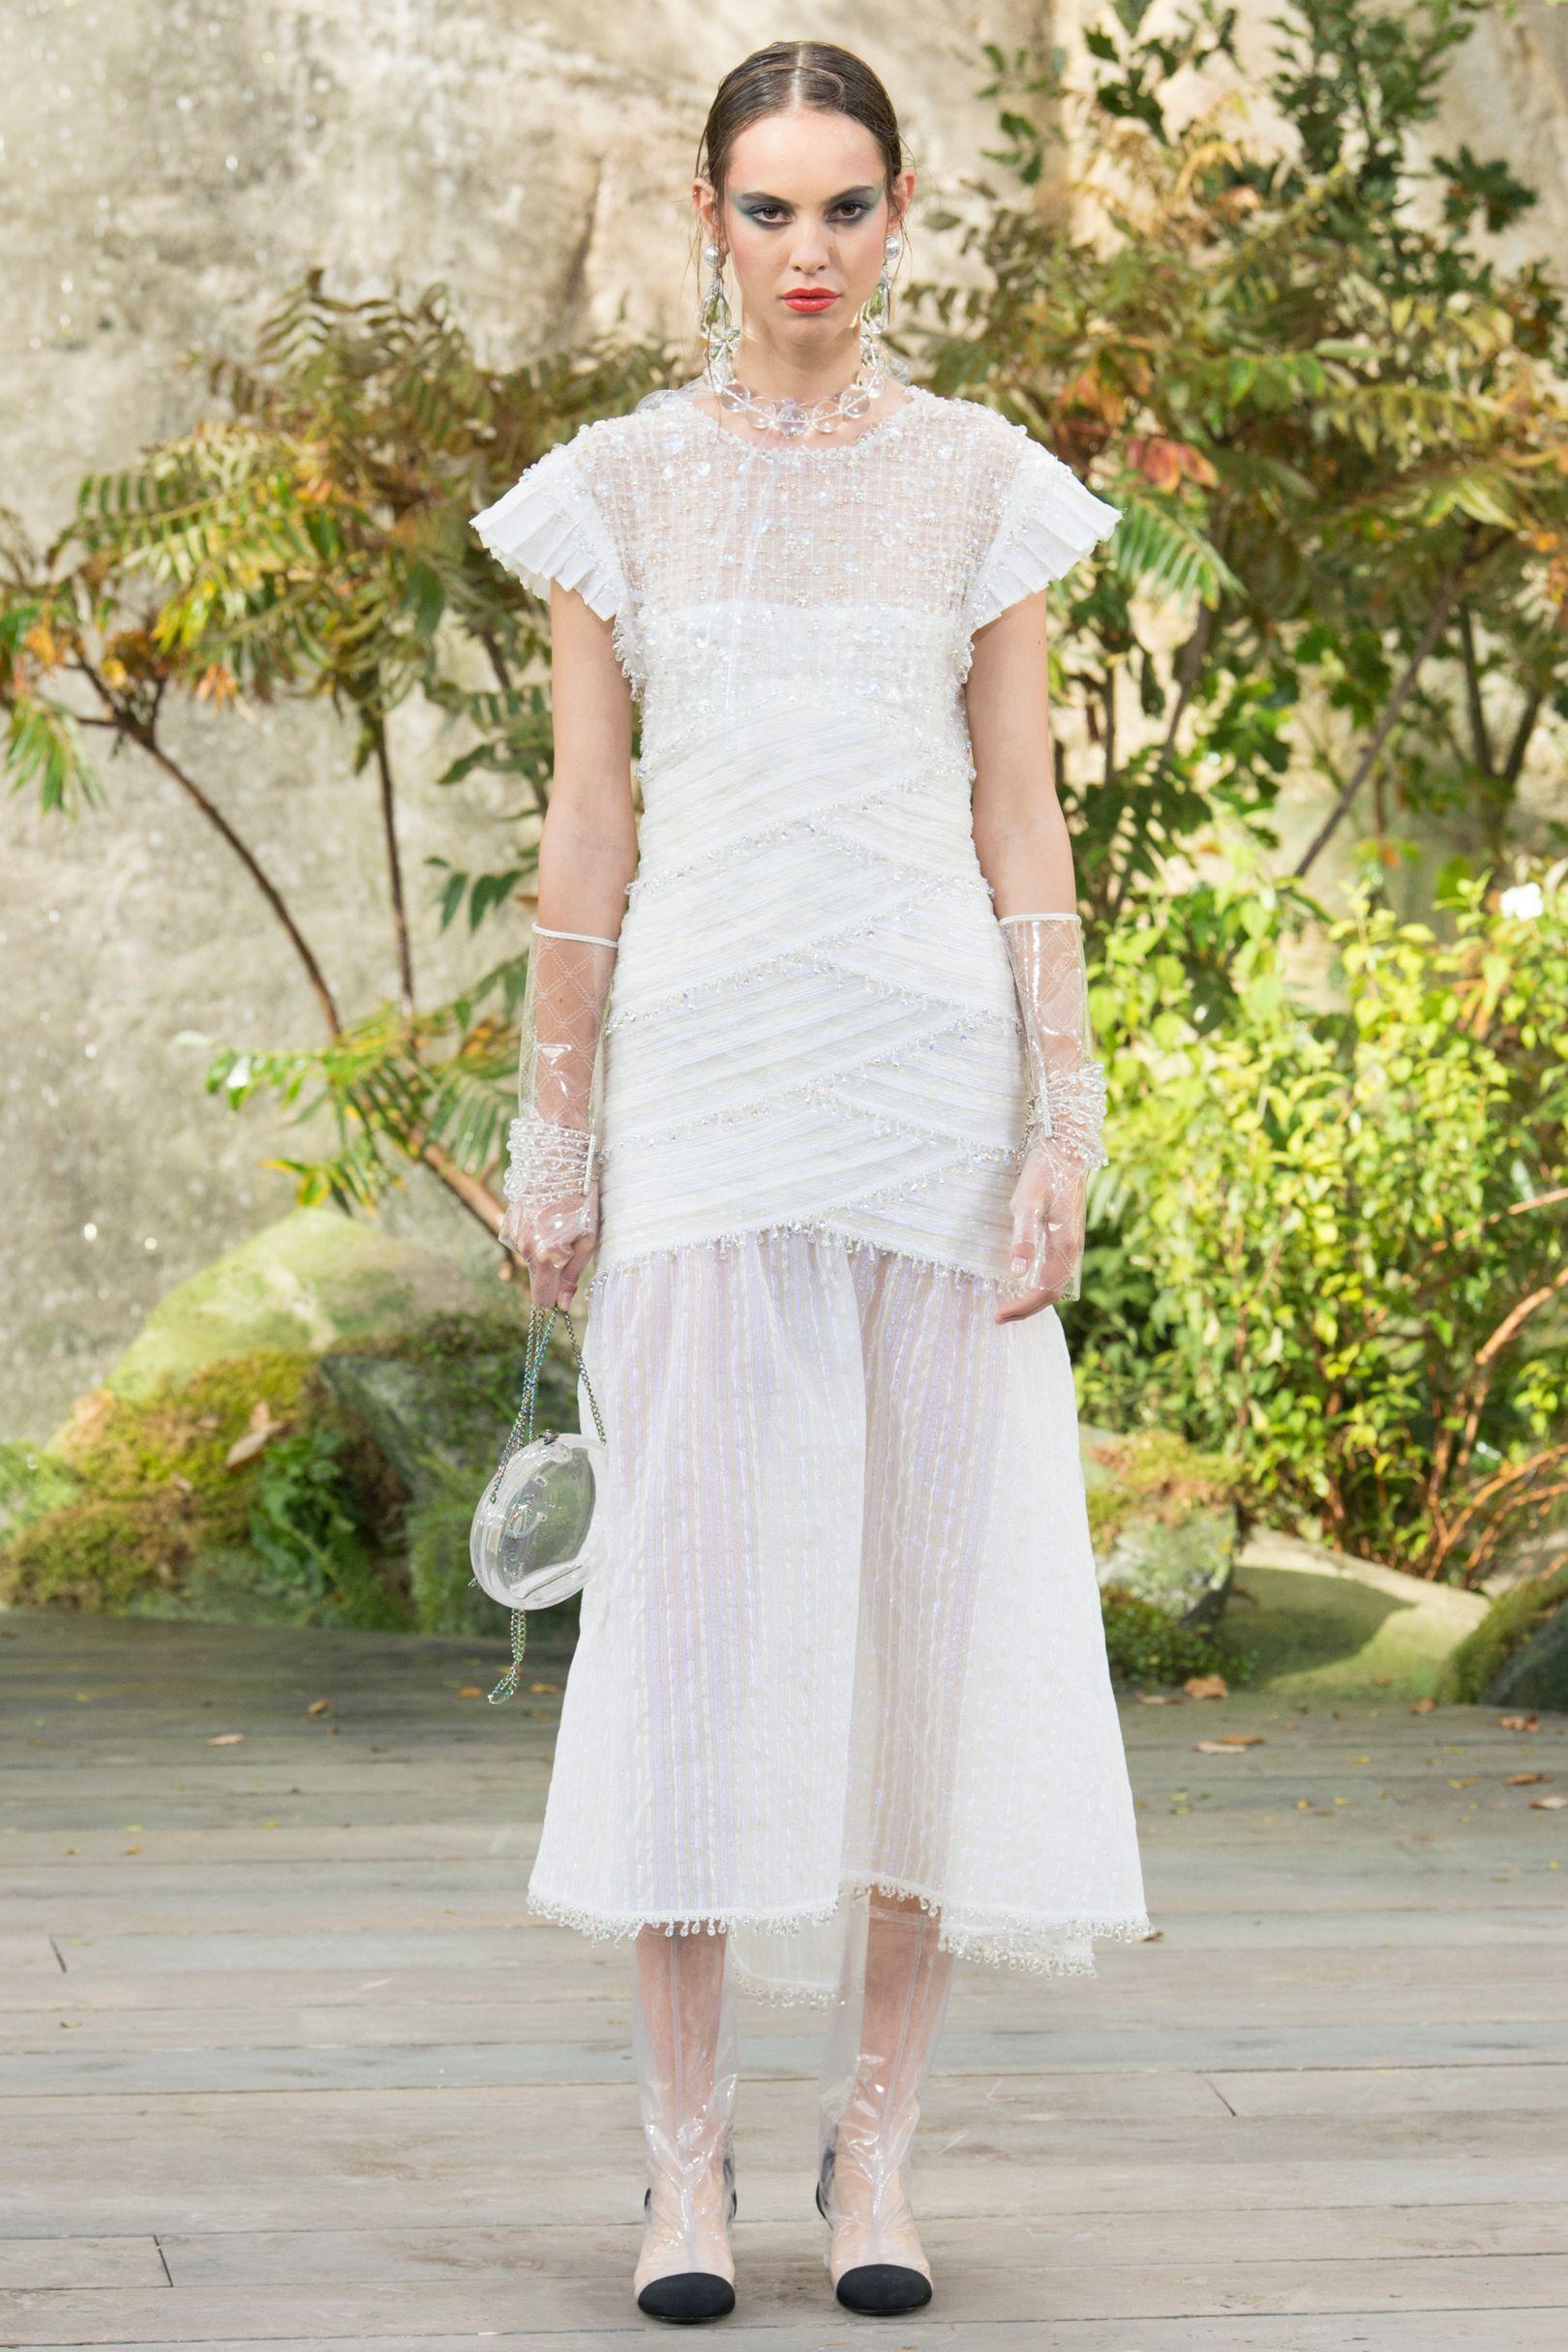 Chanel springsummer ready to wear alternative wedding